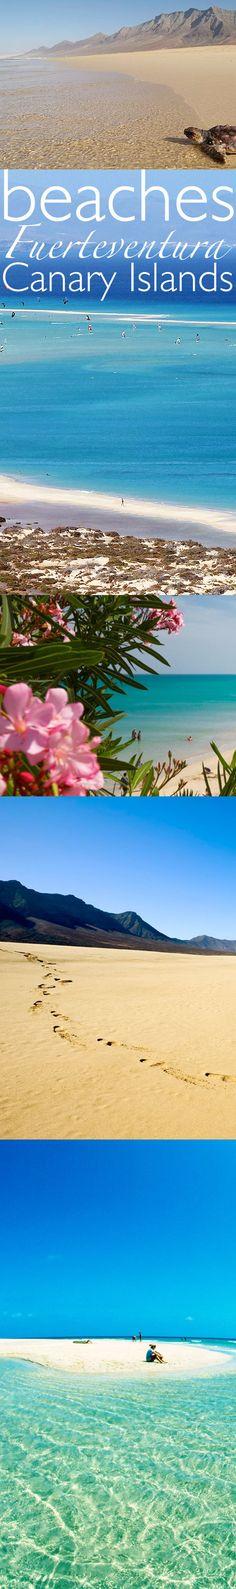 Beautiful beaches of Fuerteventura, Canary Islands, Spain